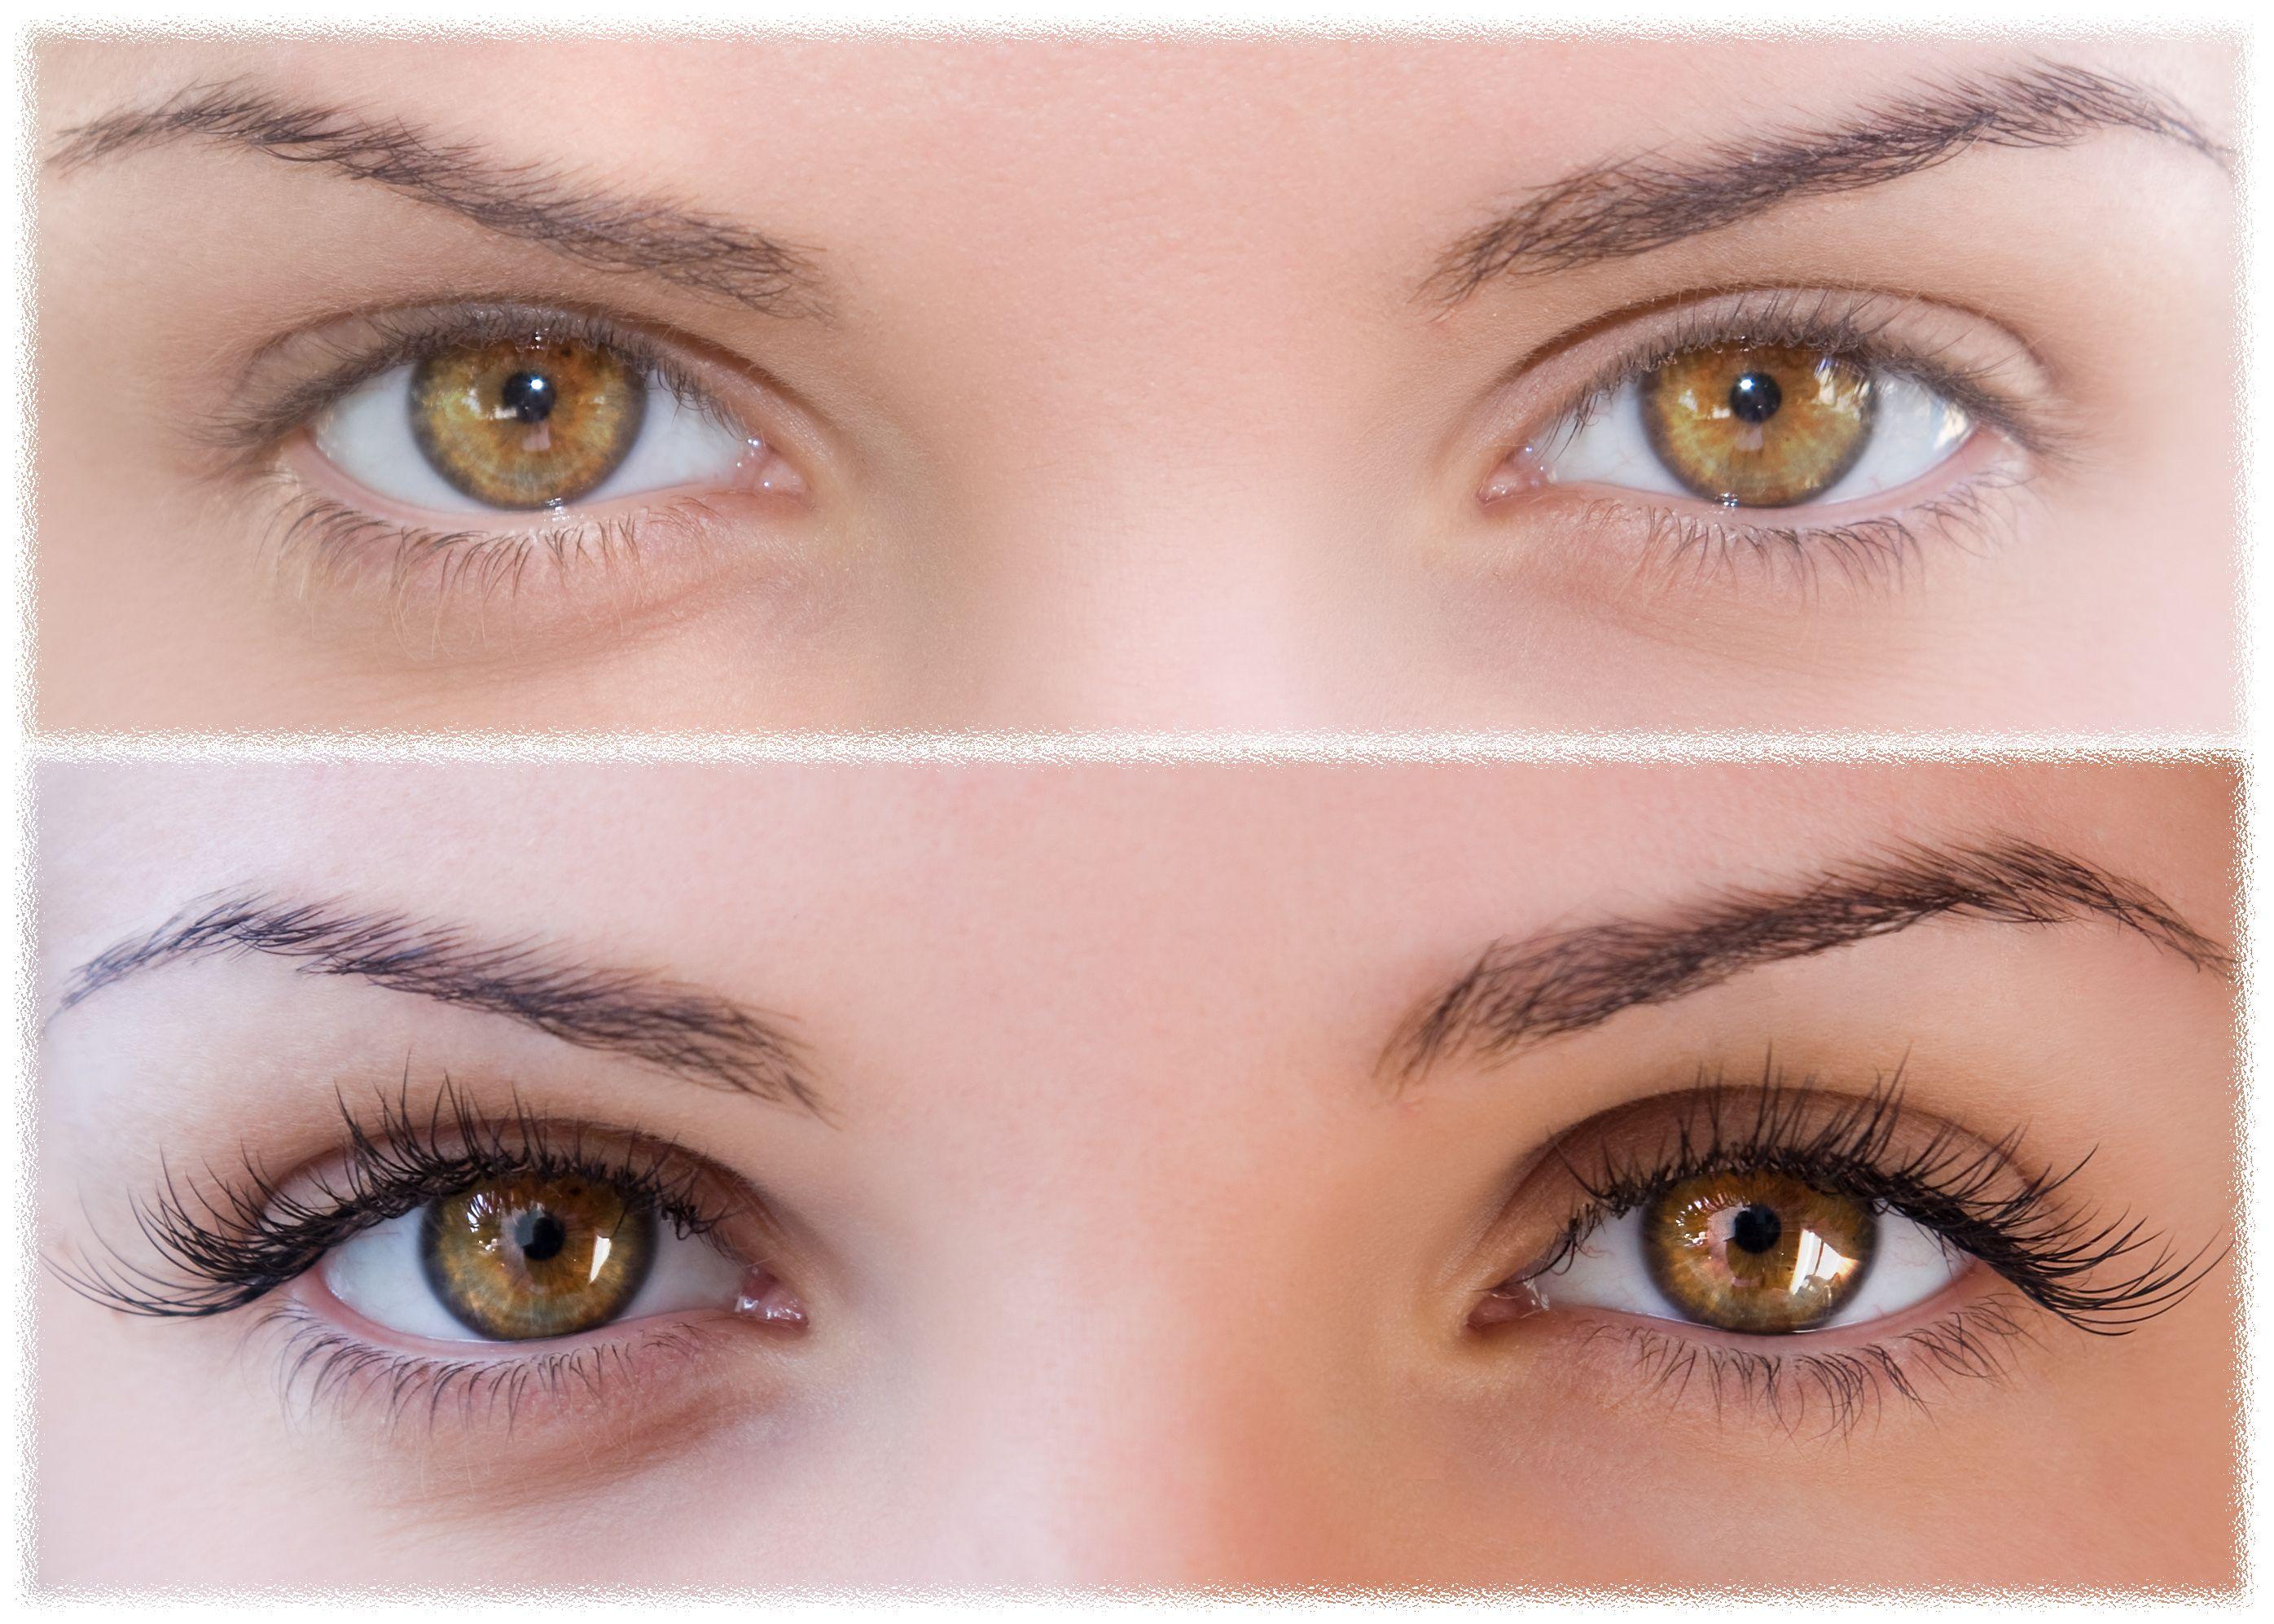 Best Natural Looking False Eyelashes Uk Makeup Cils Maquillage